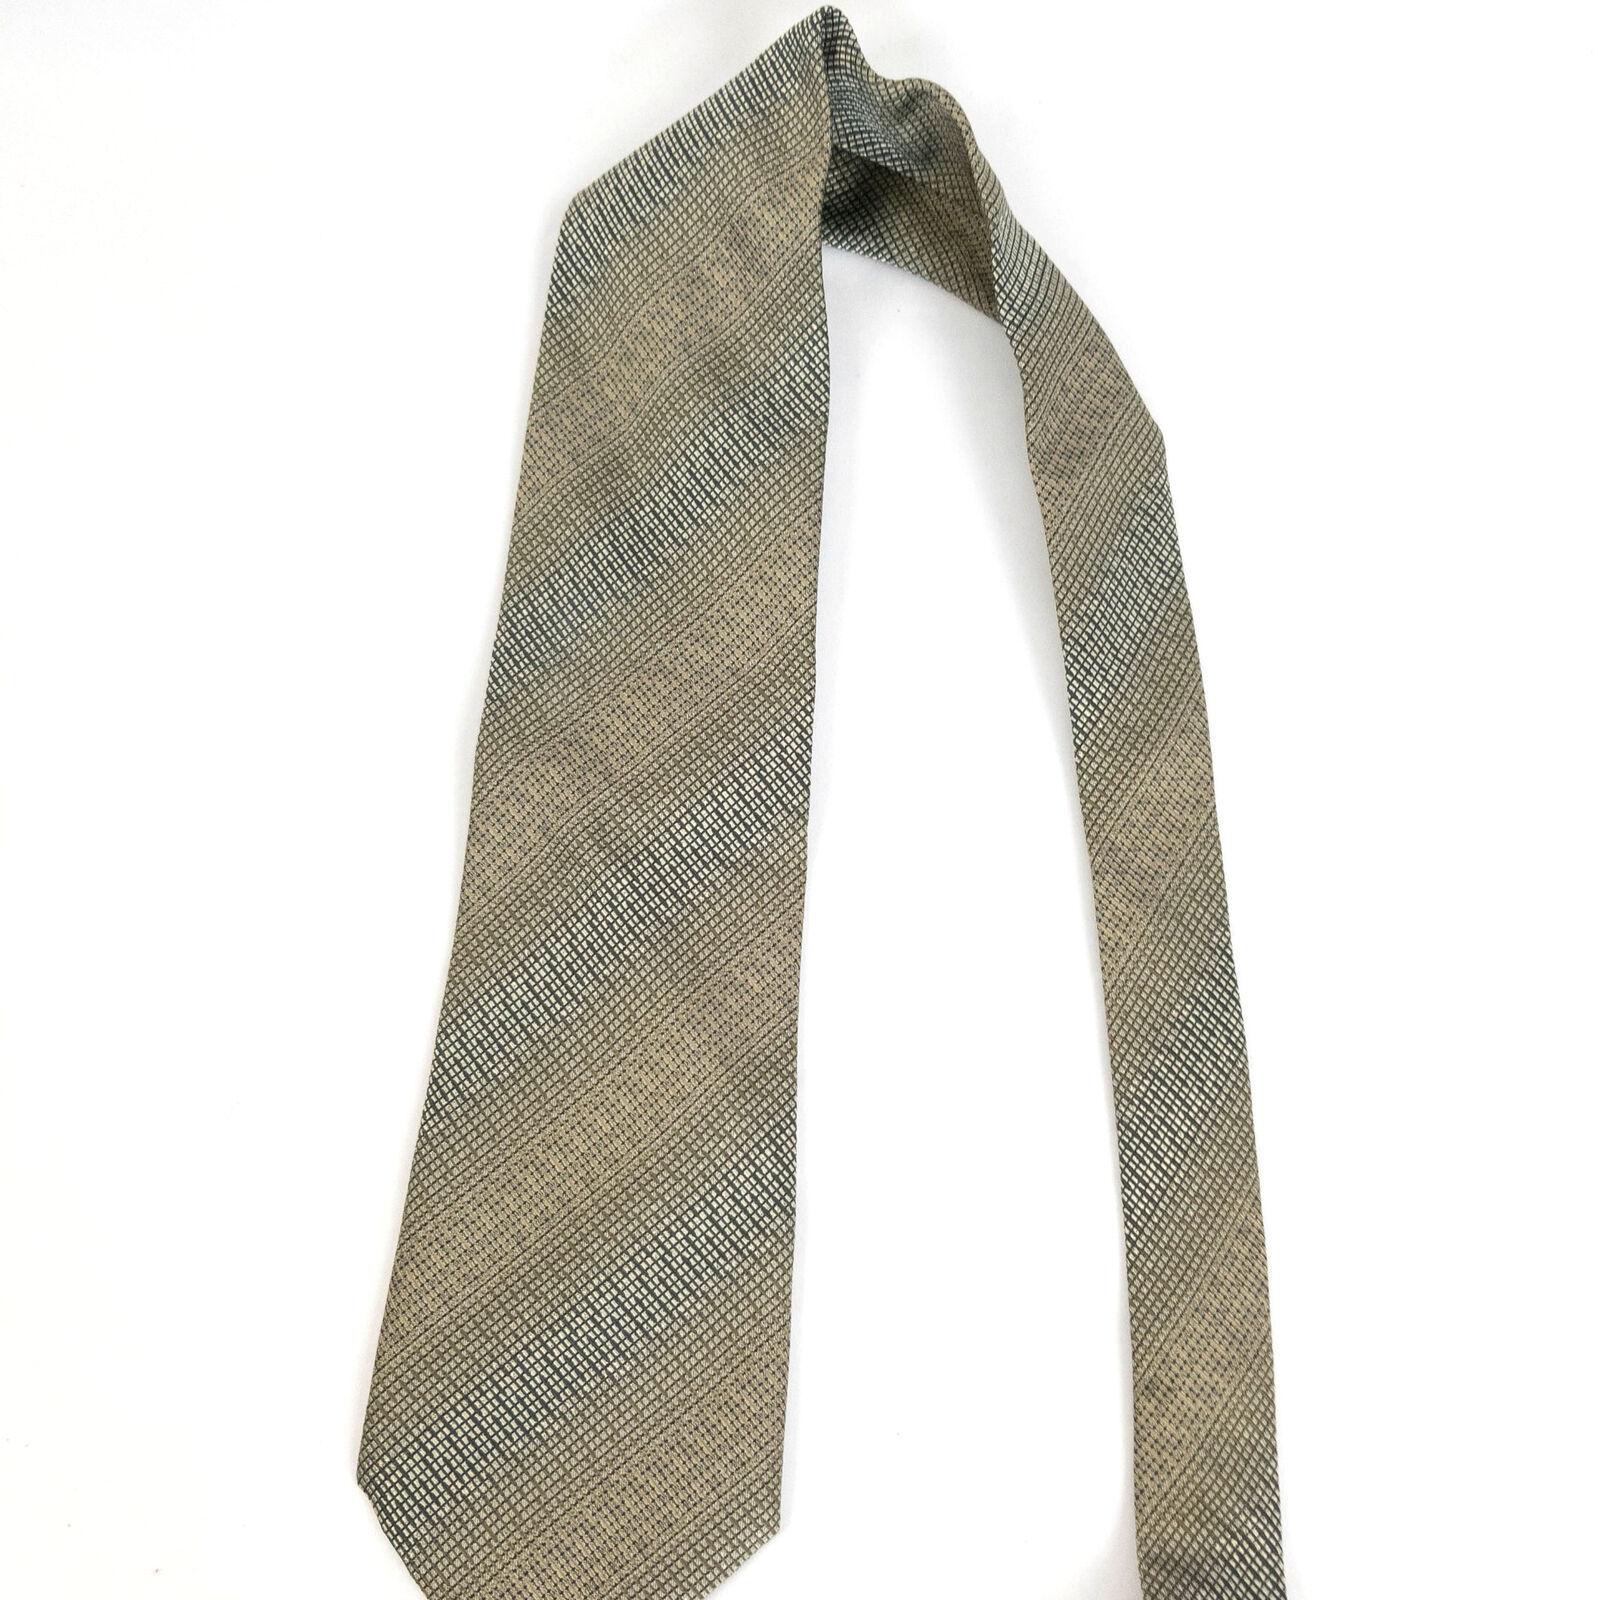 Kenneth Cole New York Green Geometric Silk Necktie Tie image 3